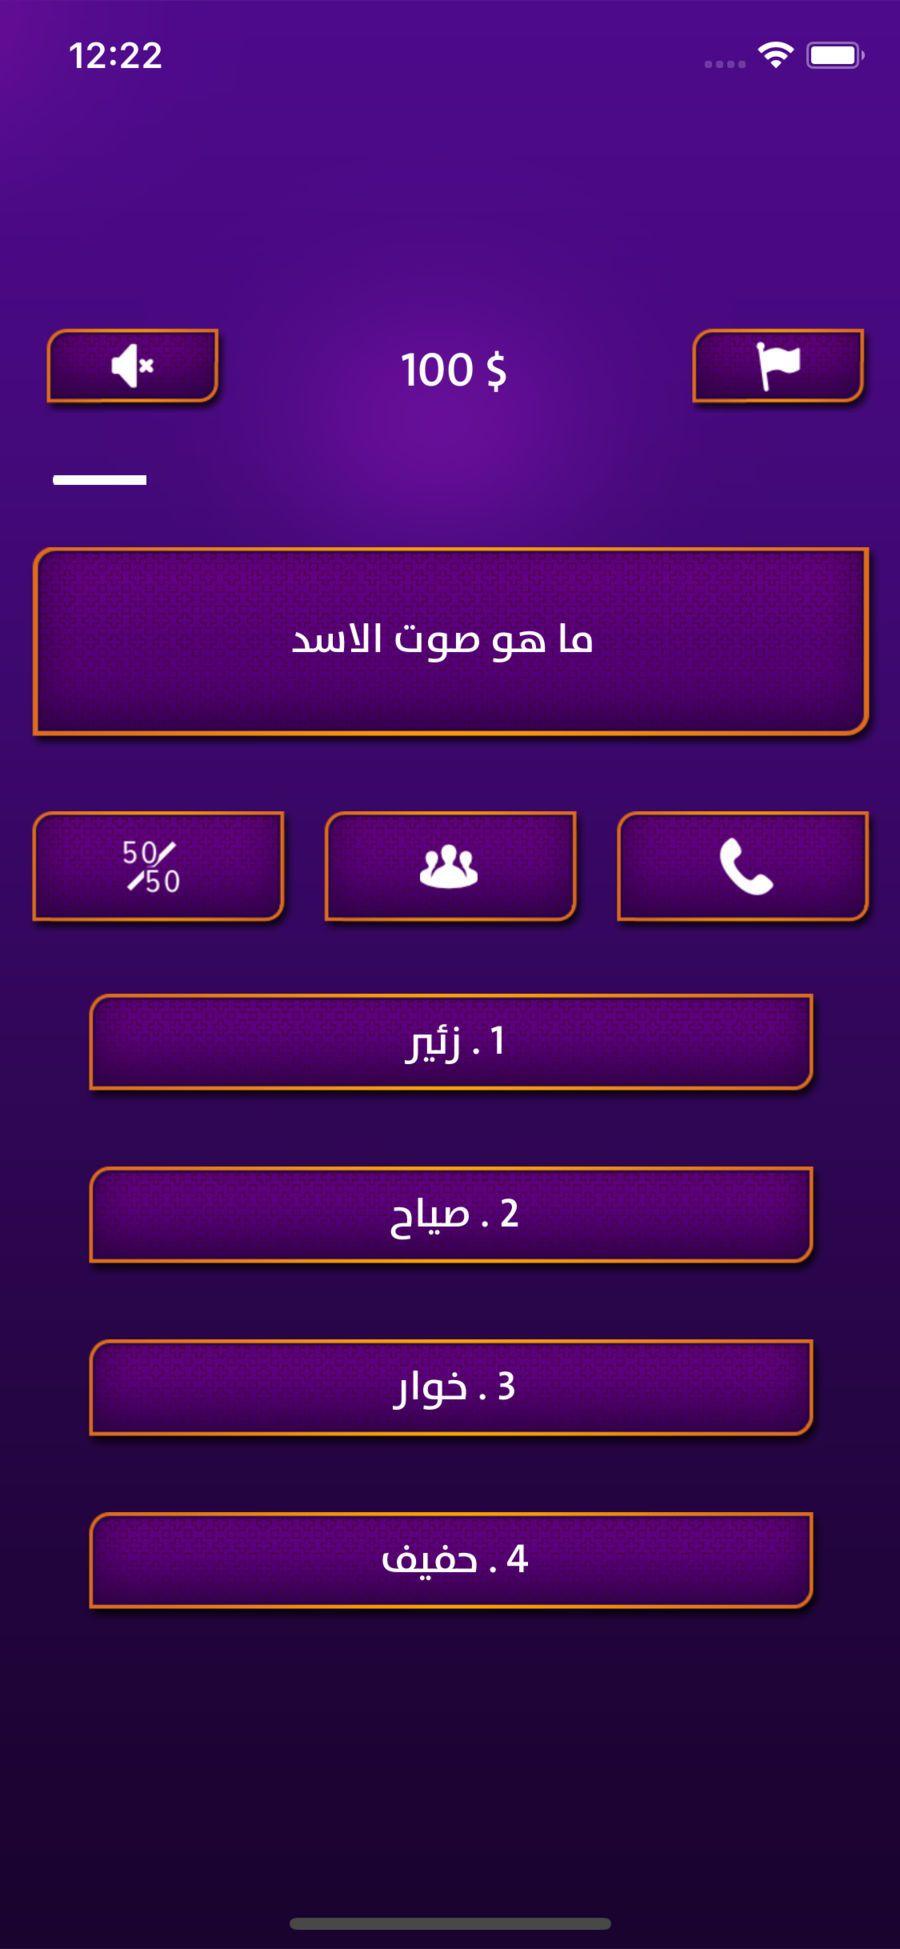 Iostriviaappapps trivia app iphone games app